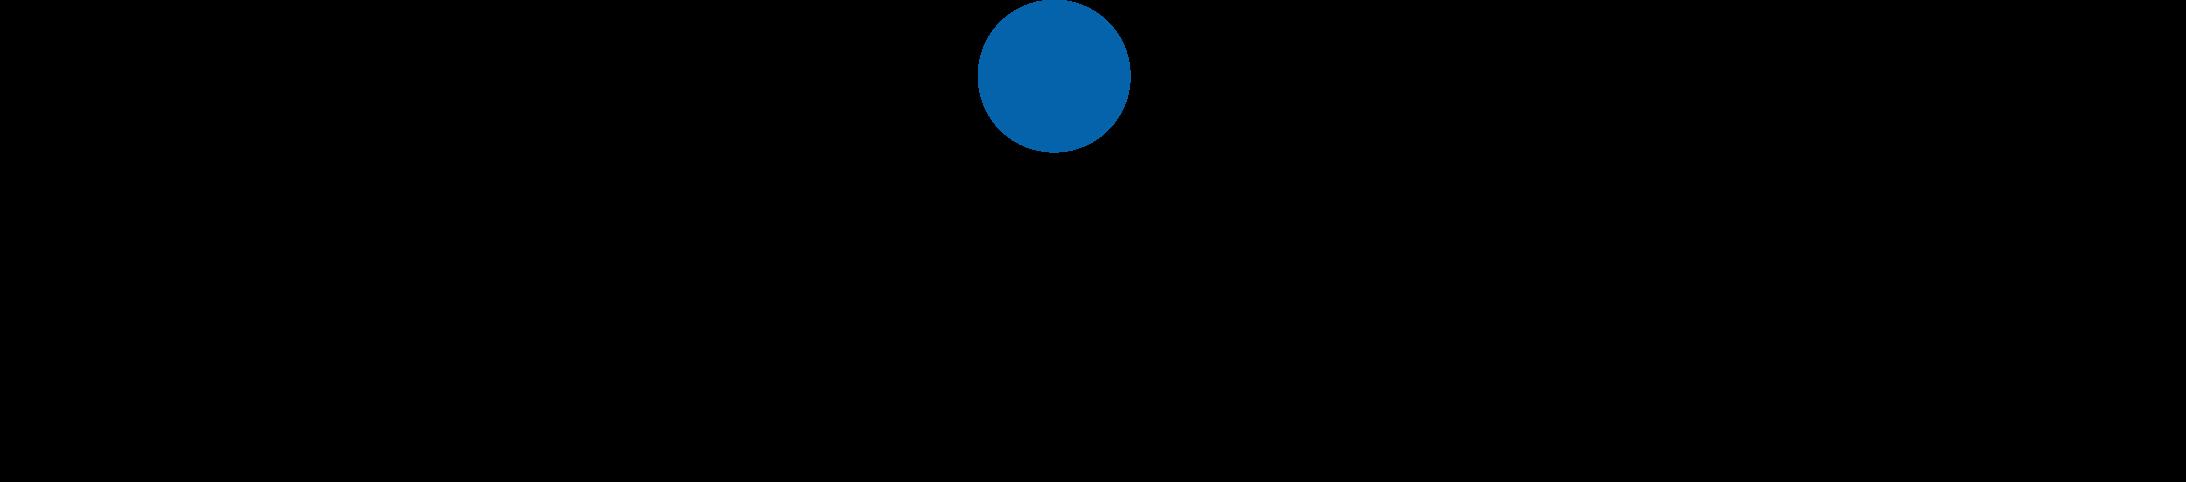 pmdm company logo